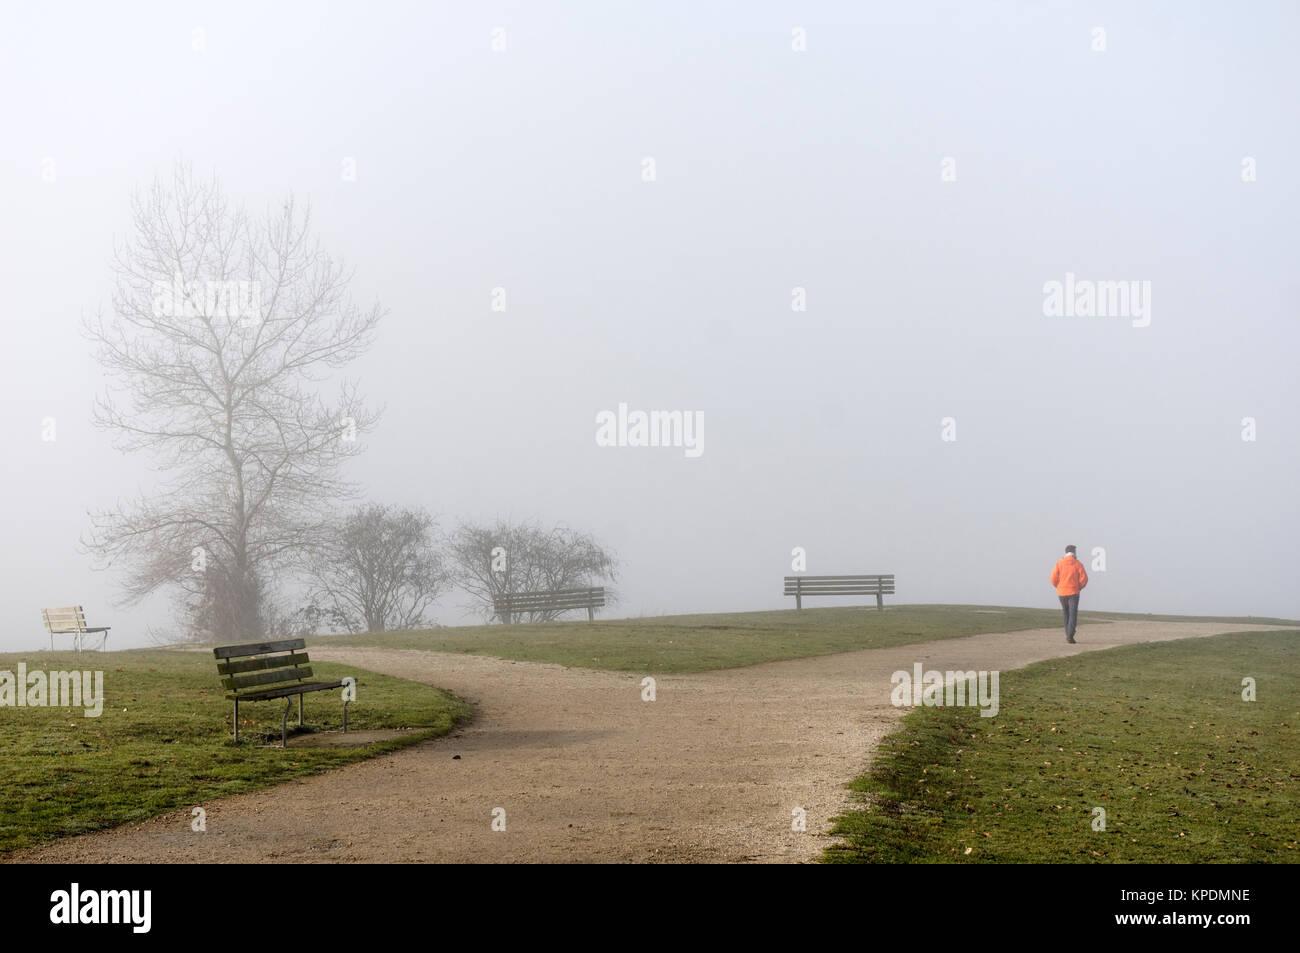 man-walking-alone-along-a-diverging-path